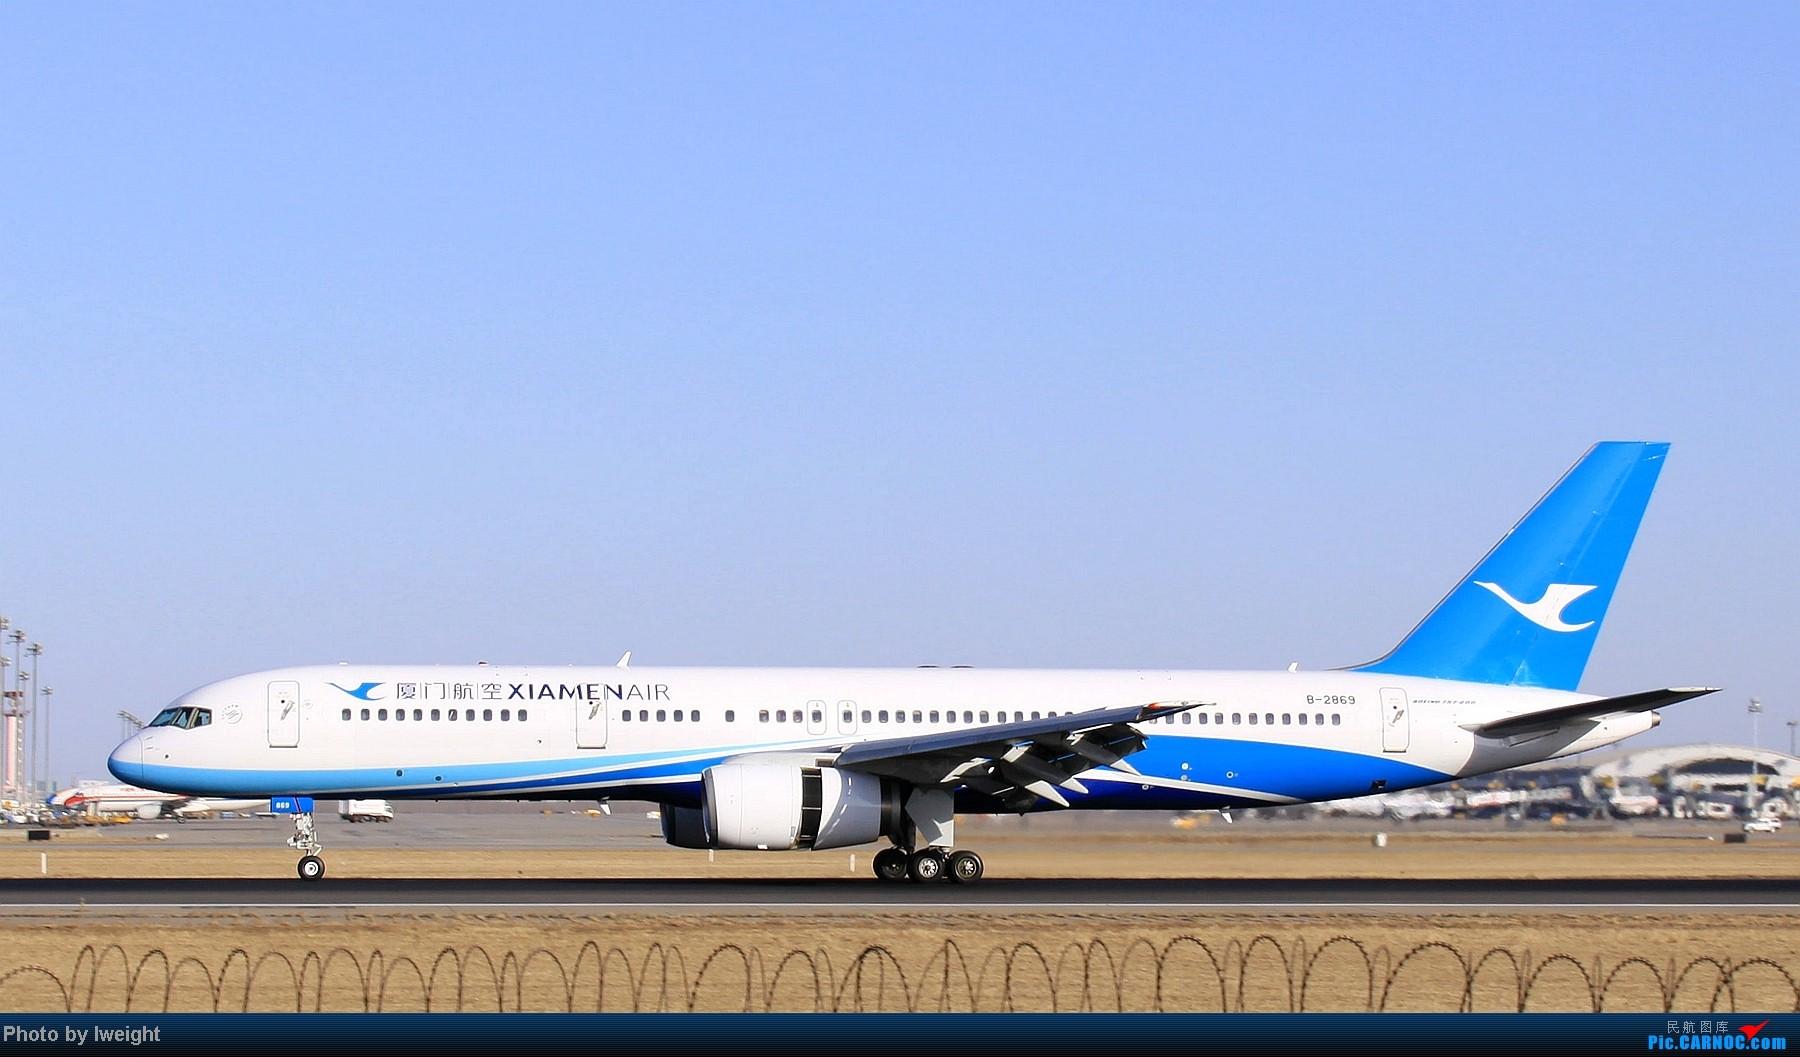 Re:[原创]春节期间首都机场拍机汇报 BOEING 757-200 B-2869 中国北京首都机场